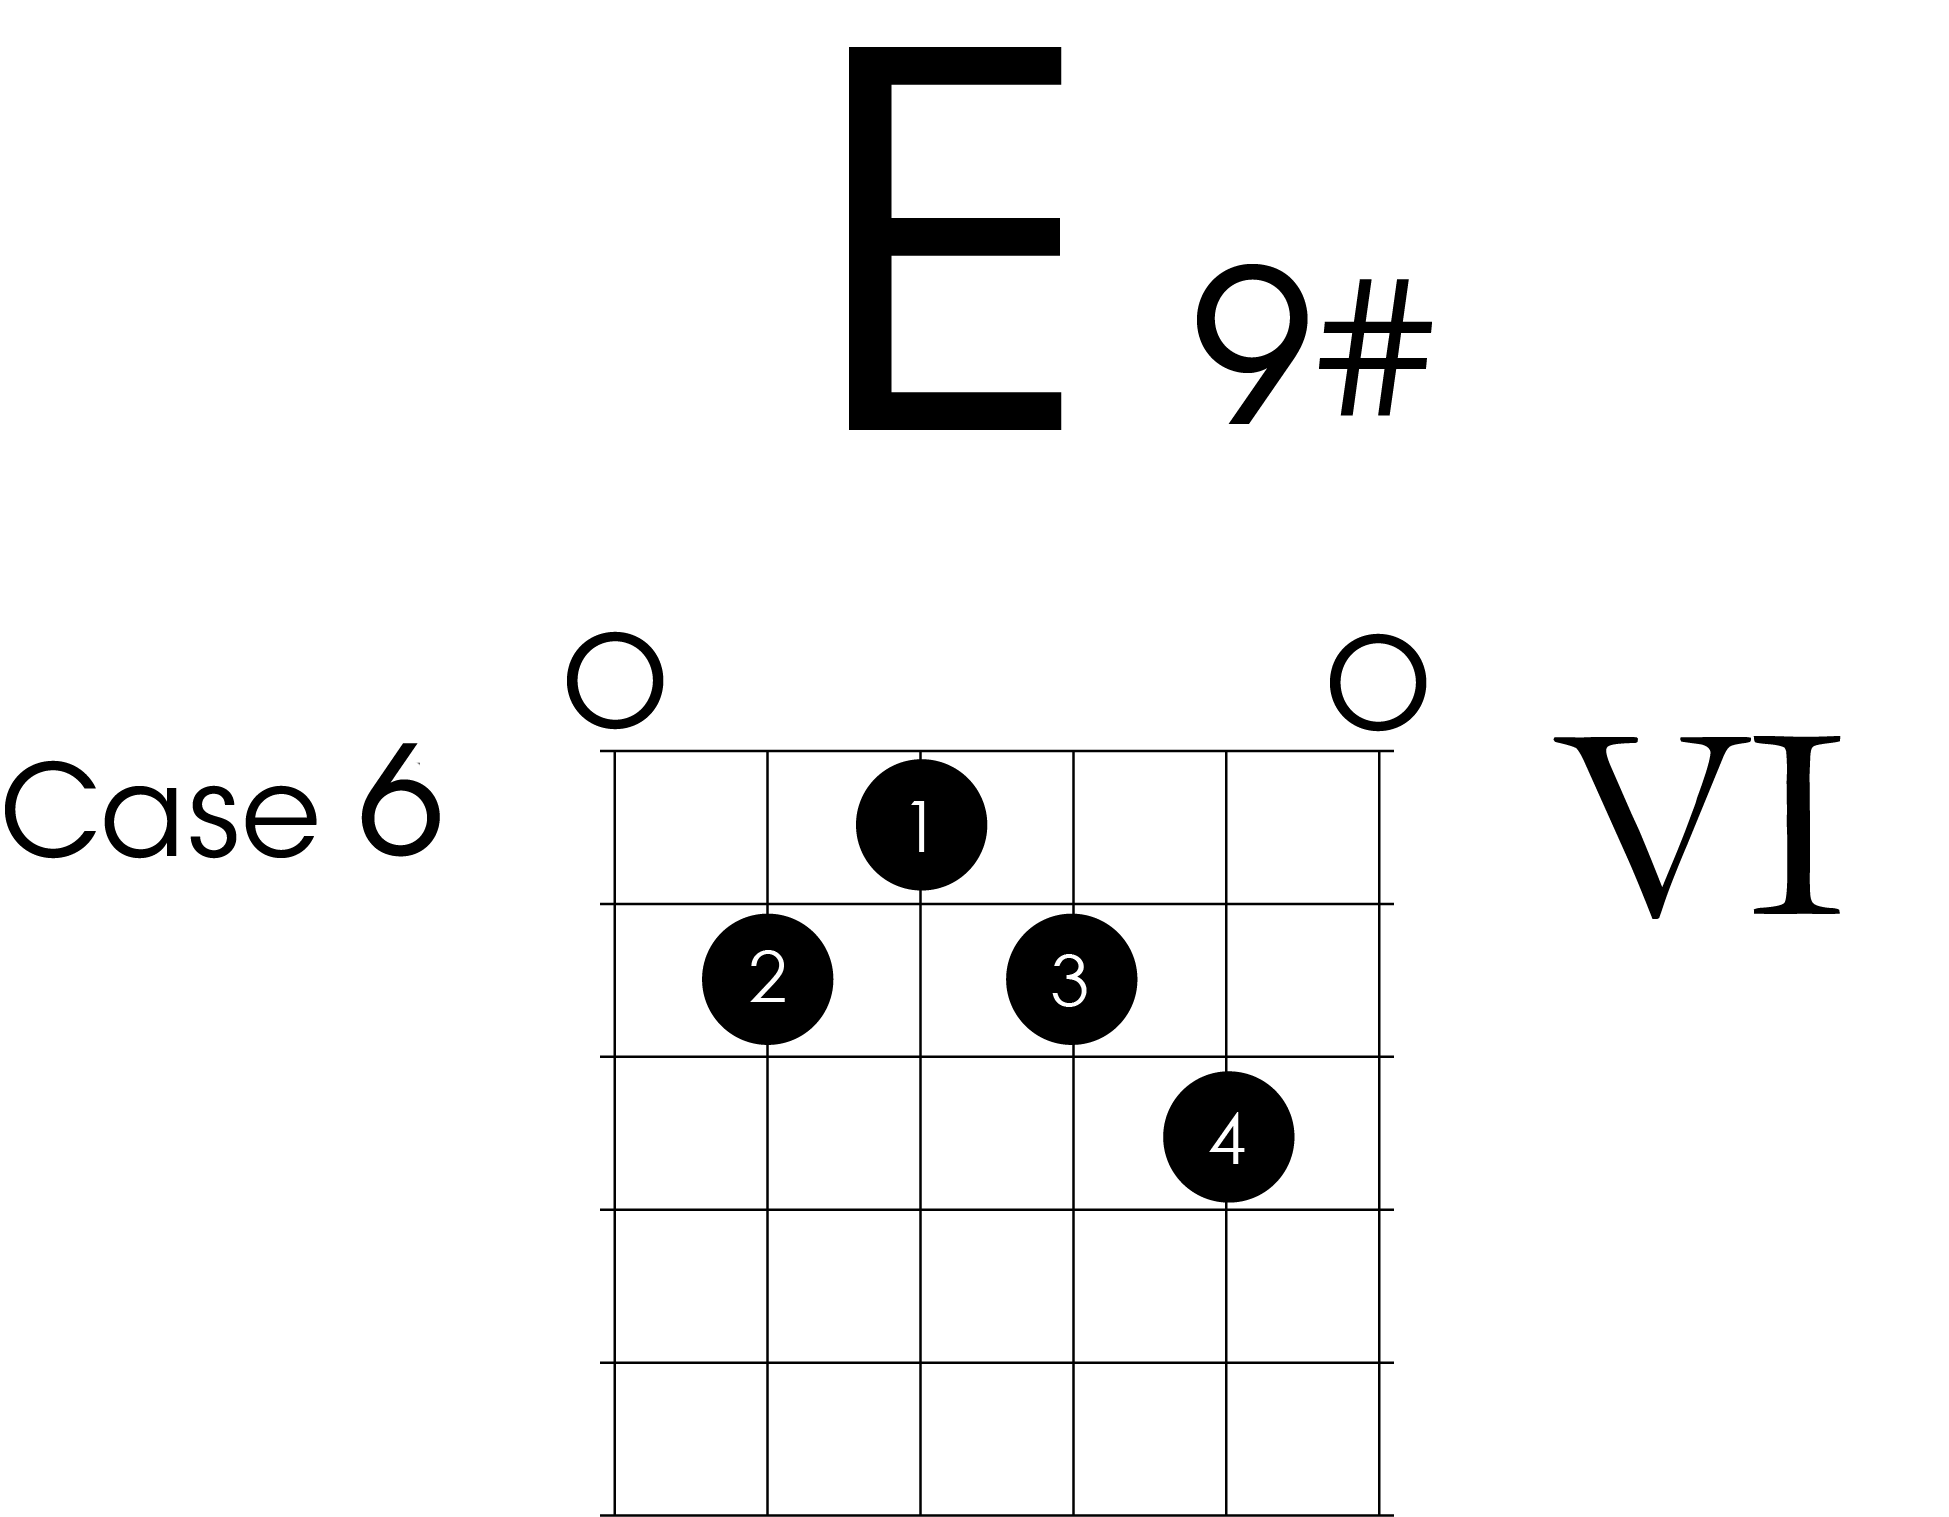 Diagramme accord Mi 9 # E9# guitare débutant jimi hendrix